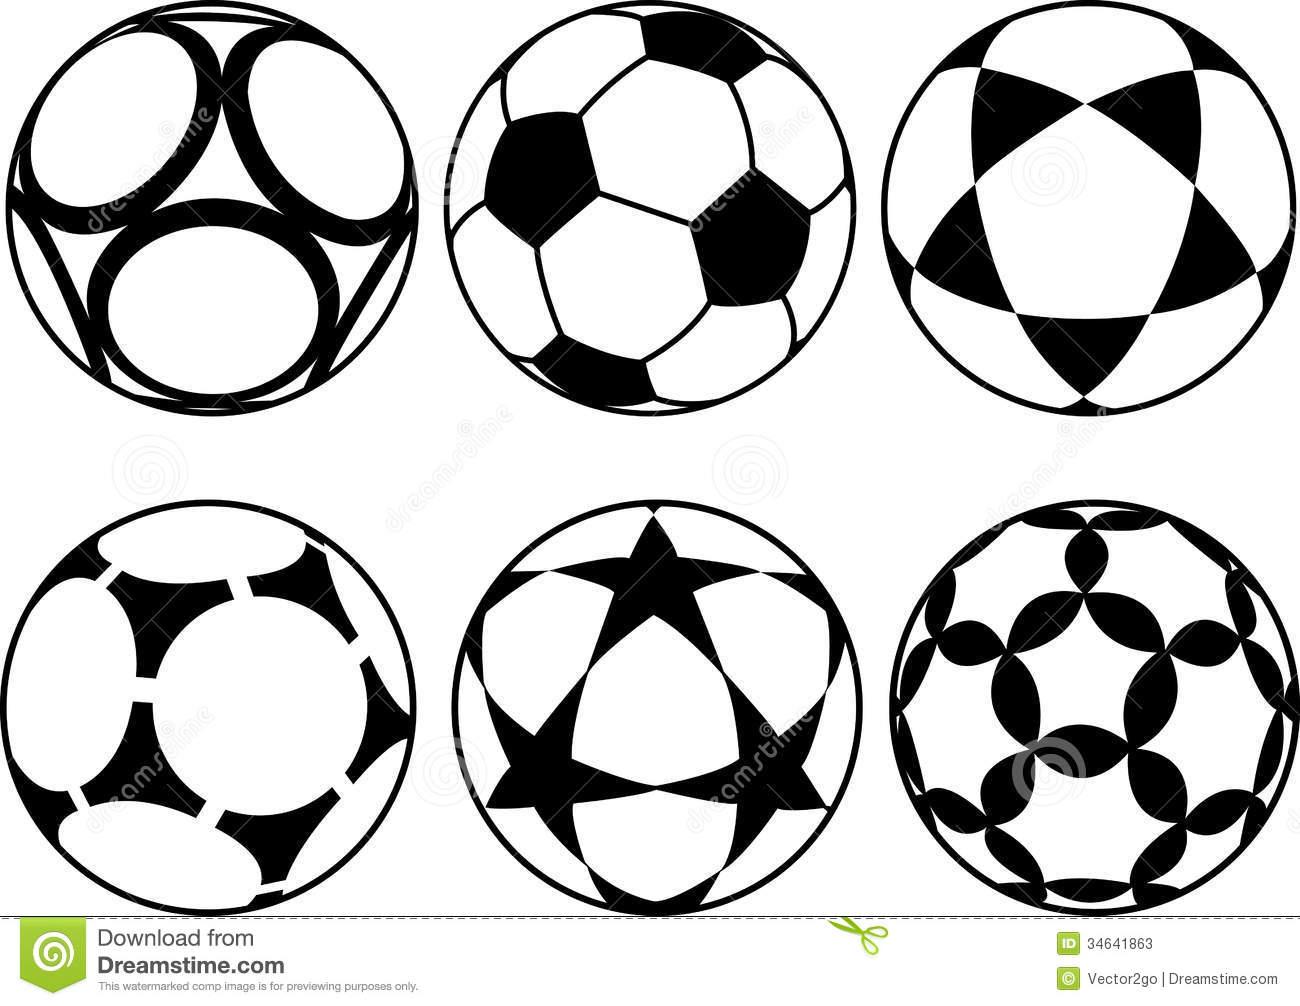 Ball clipart black and white. Balls station